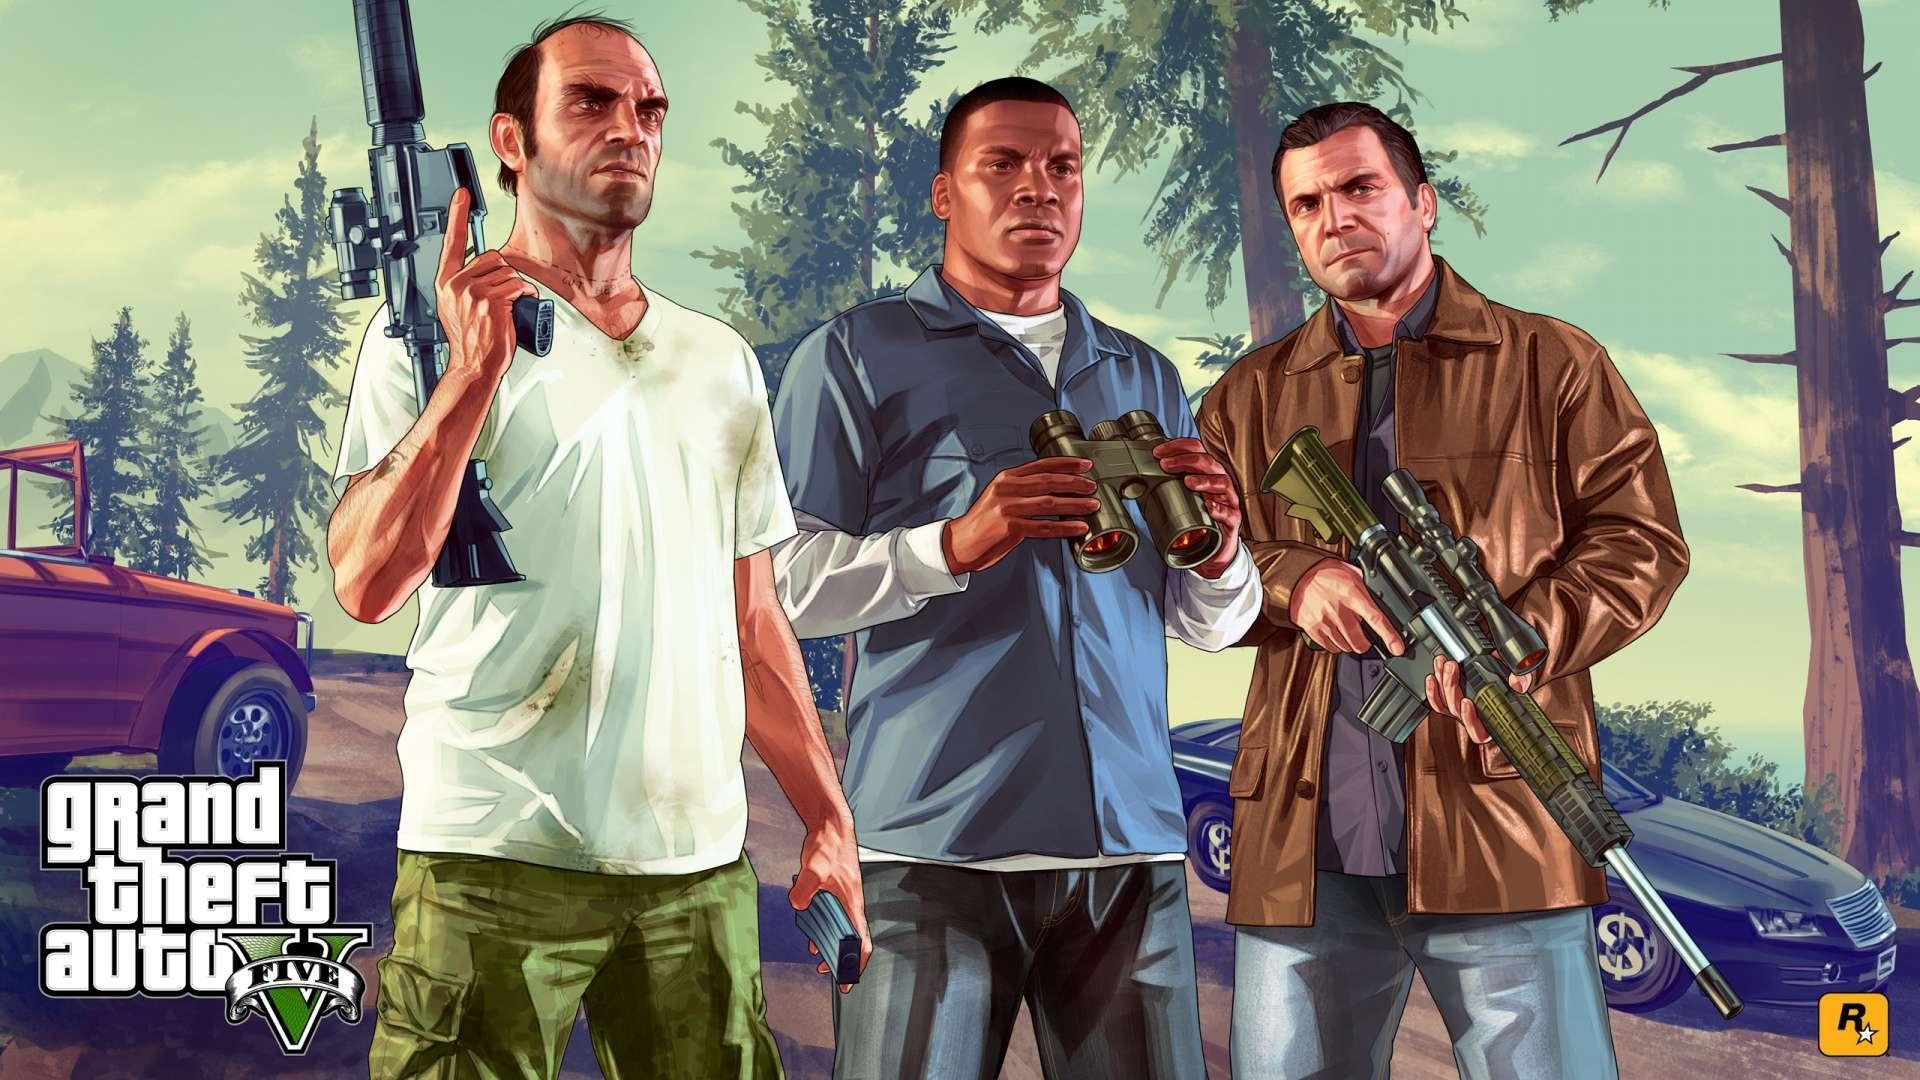 Wallpaper Grand Theft Auto Gta 5 HD Wallpaper 1080p Upload at March 1920x1080